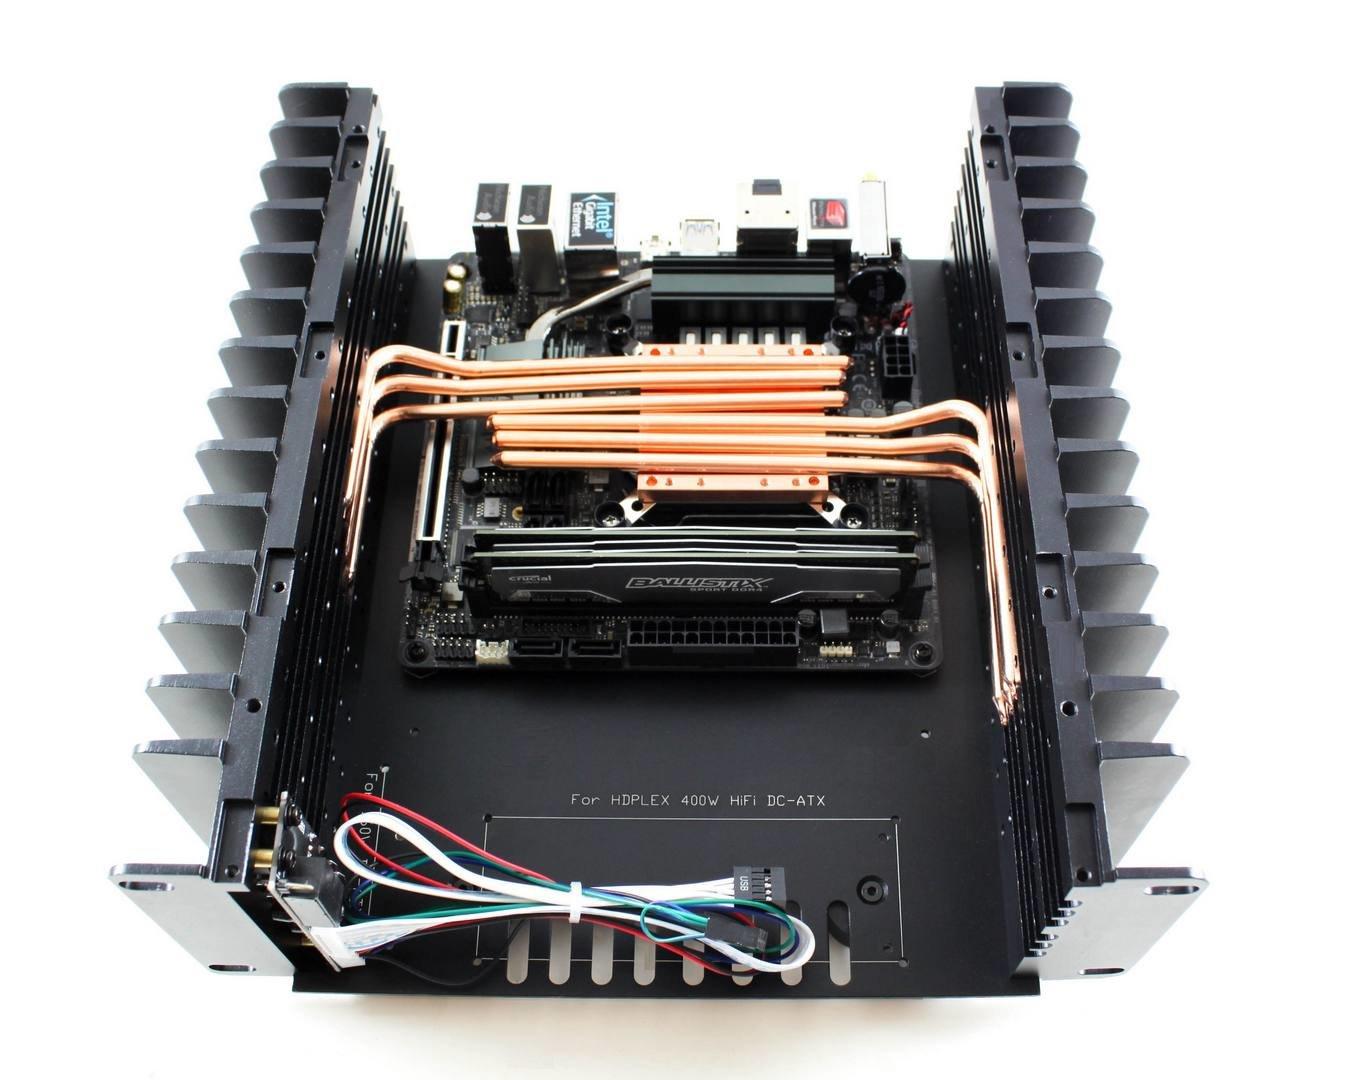 Hdplex H3 V3: Flexible Kühlung mit 6 Heatpipes für 80 Watt TDP